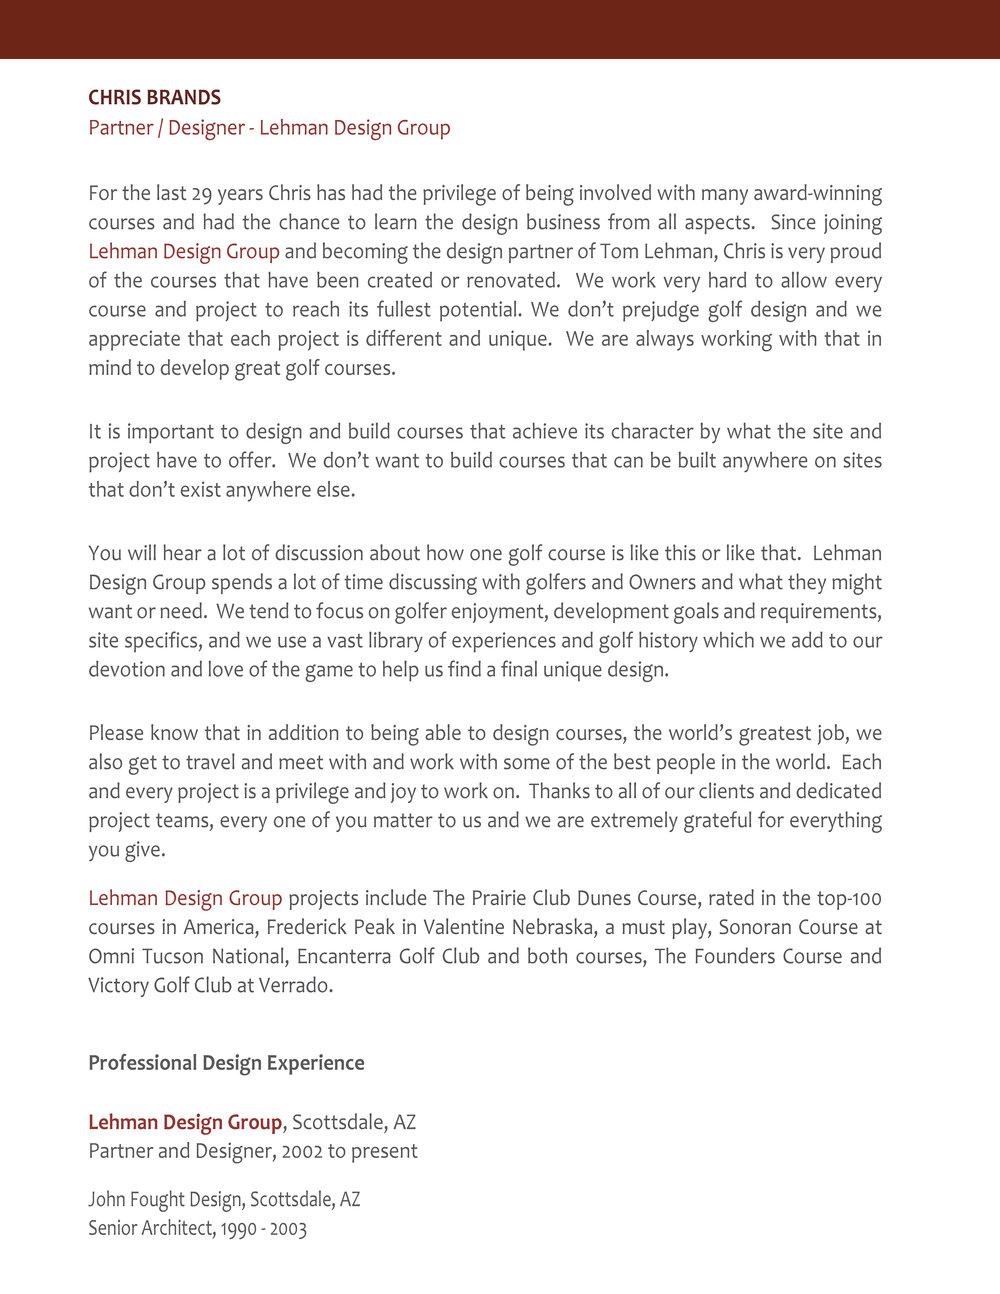 LDG Bio feb 2019_Page_09.jpg